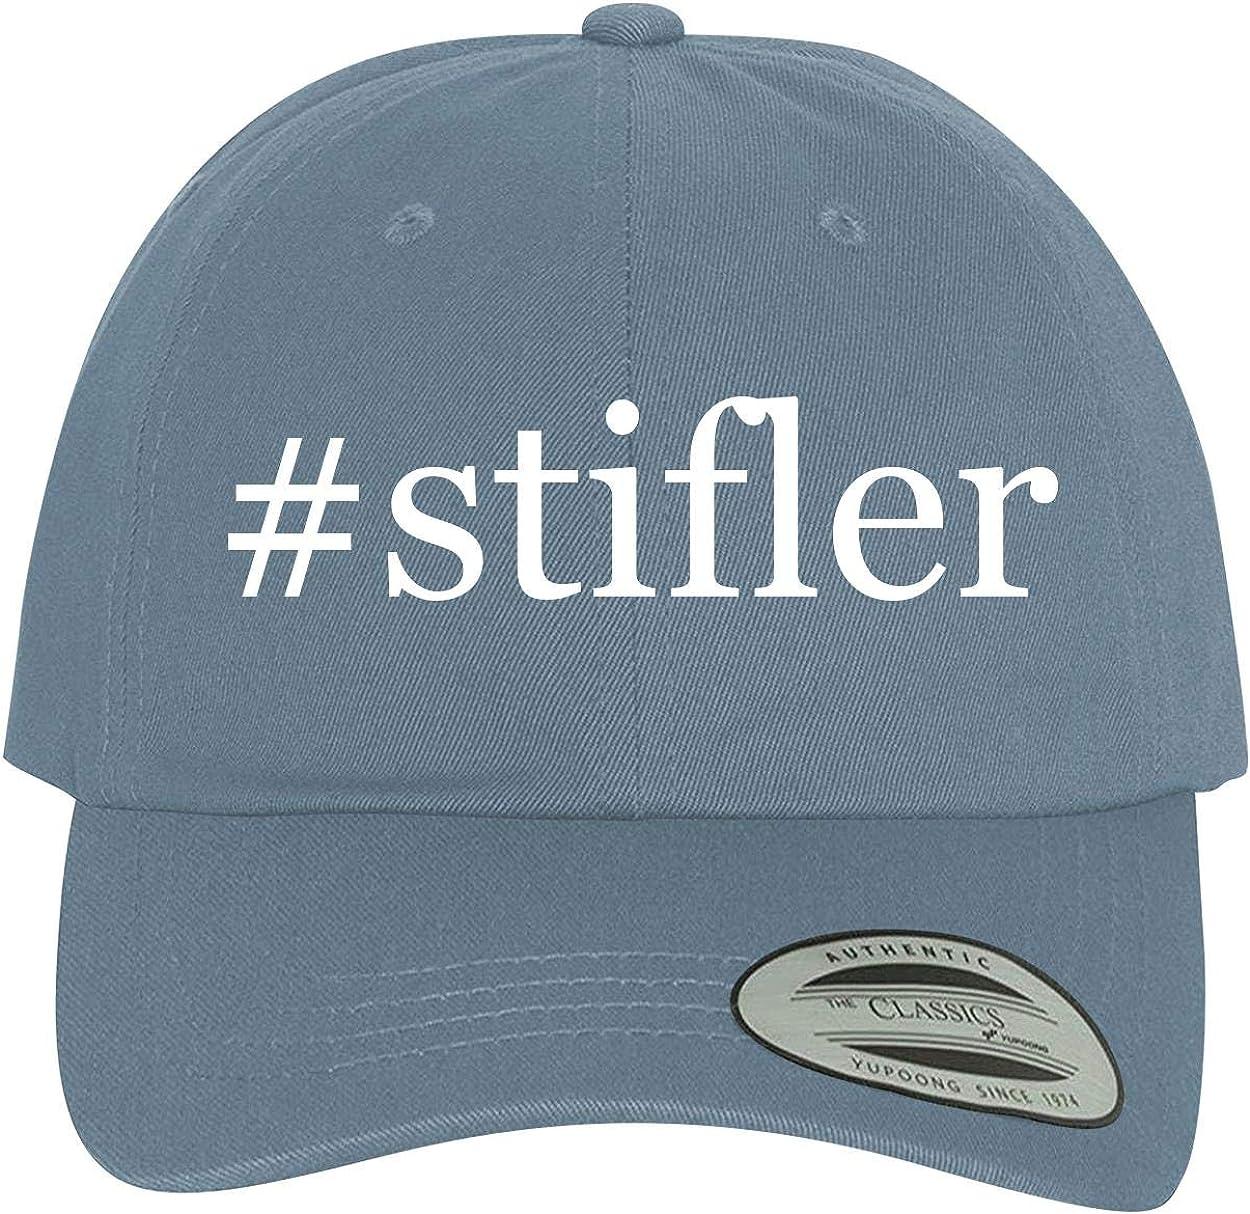 BH Cool Designs #Stifler Comfortable Dad Hat Baseball Cap